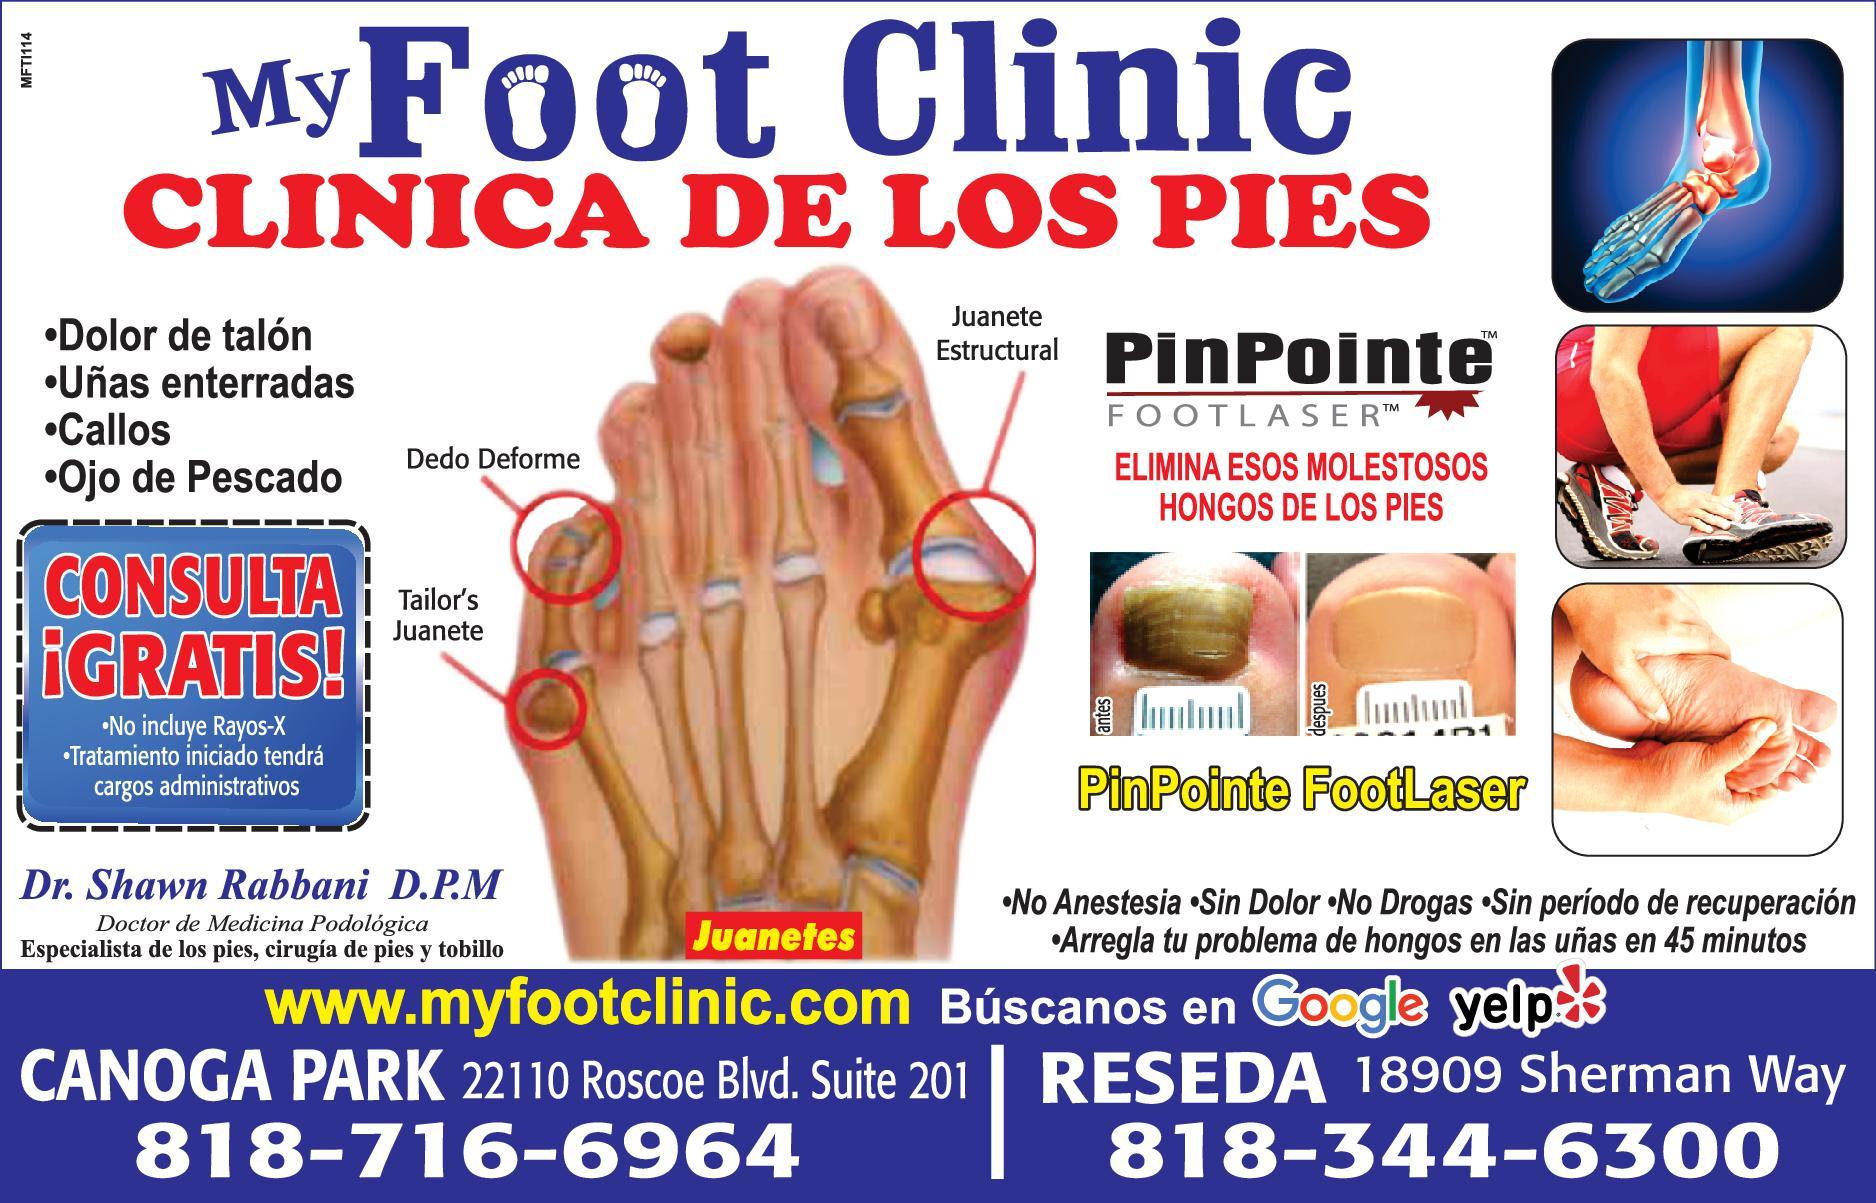 MY FOOT CLINIC DR. SHAWN RABBANI